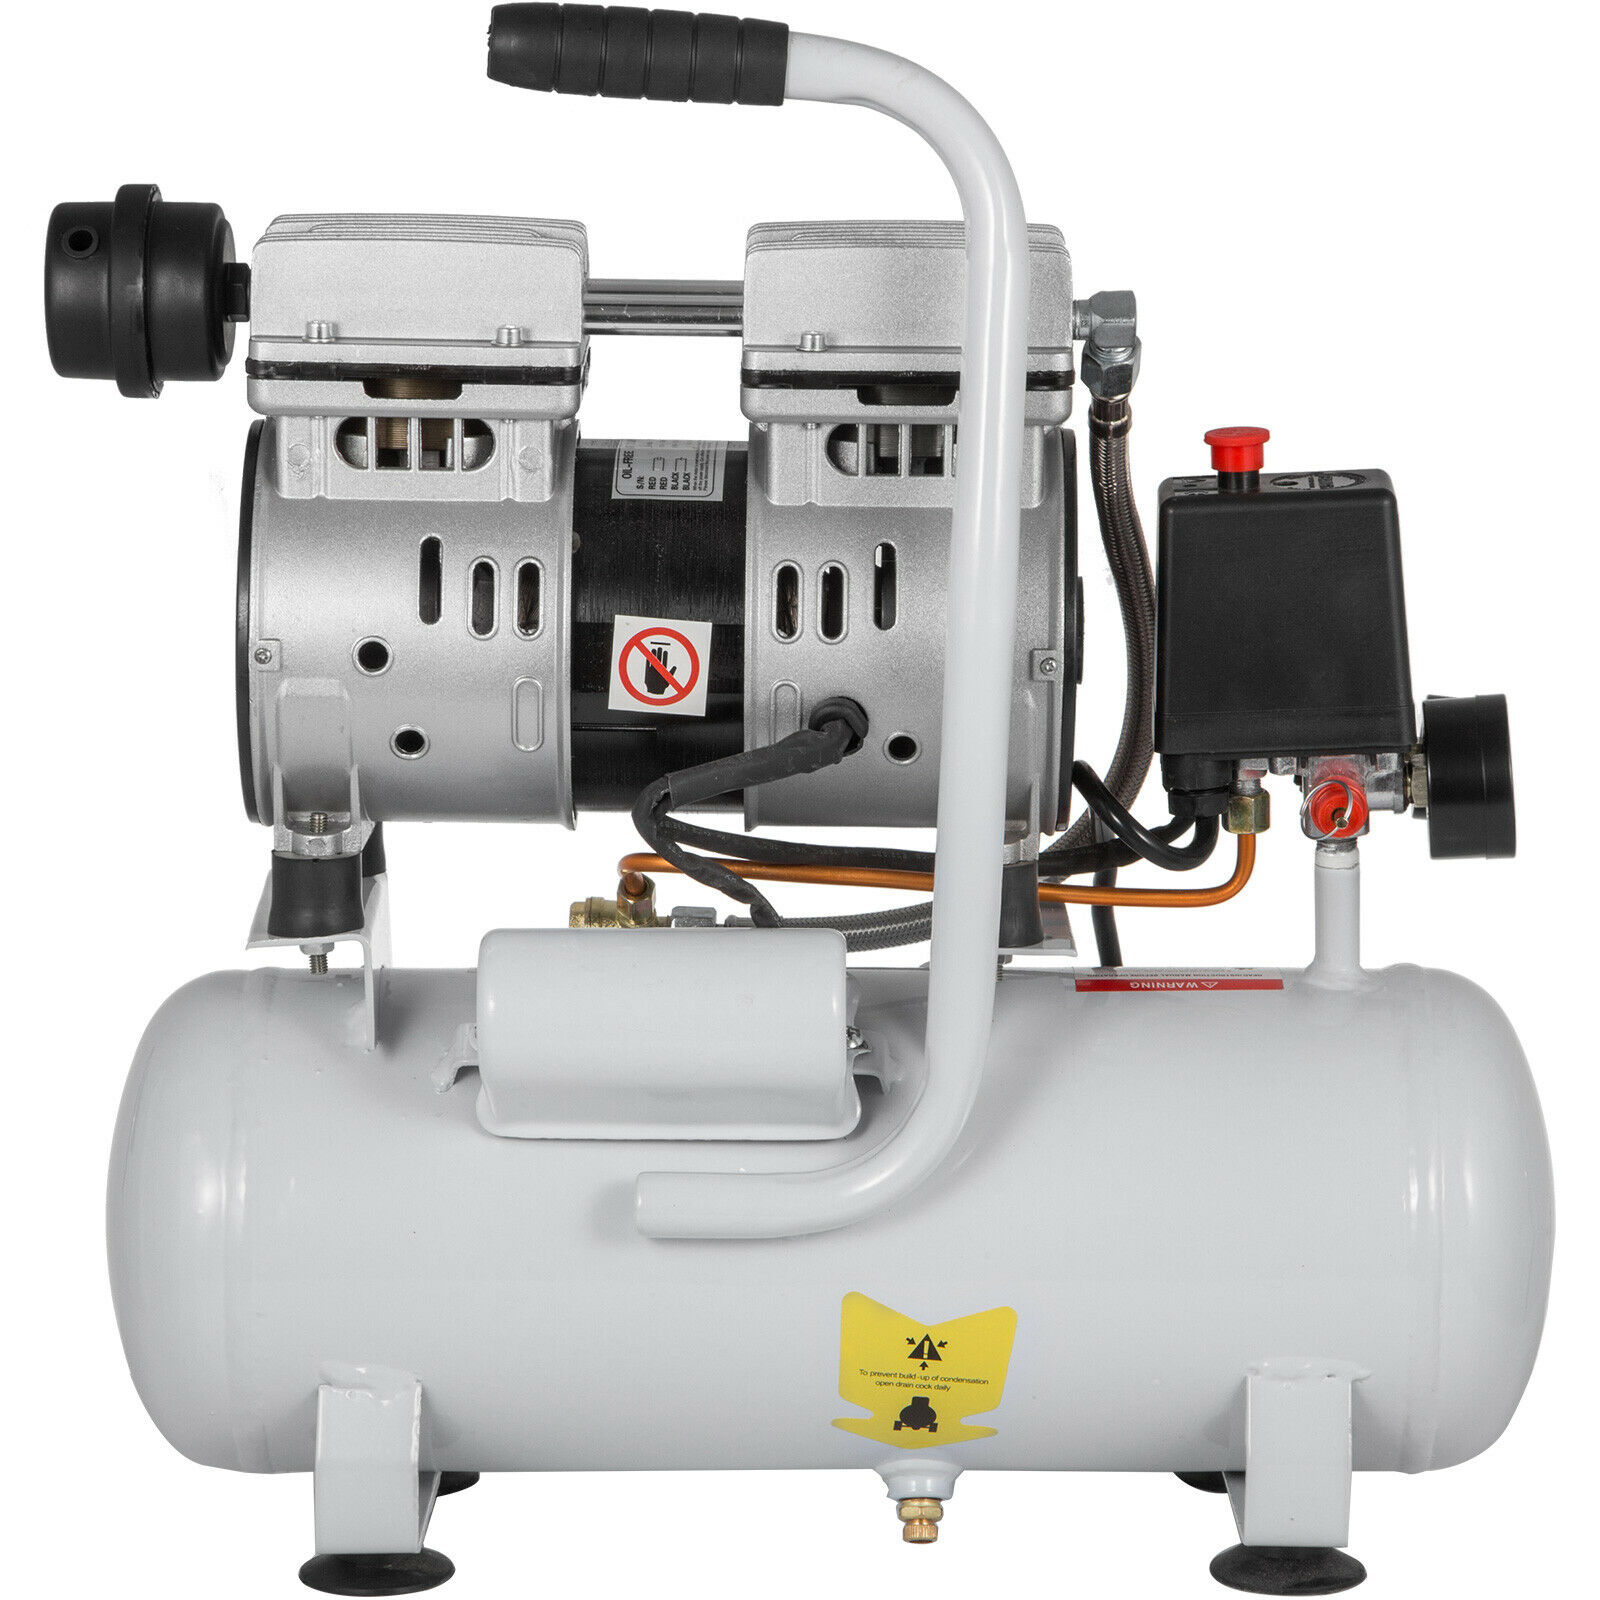 Whisper Compressor Oil Free Air Compressor 9L Heat Dissipation Manometer Silent